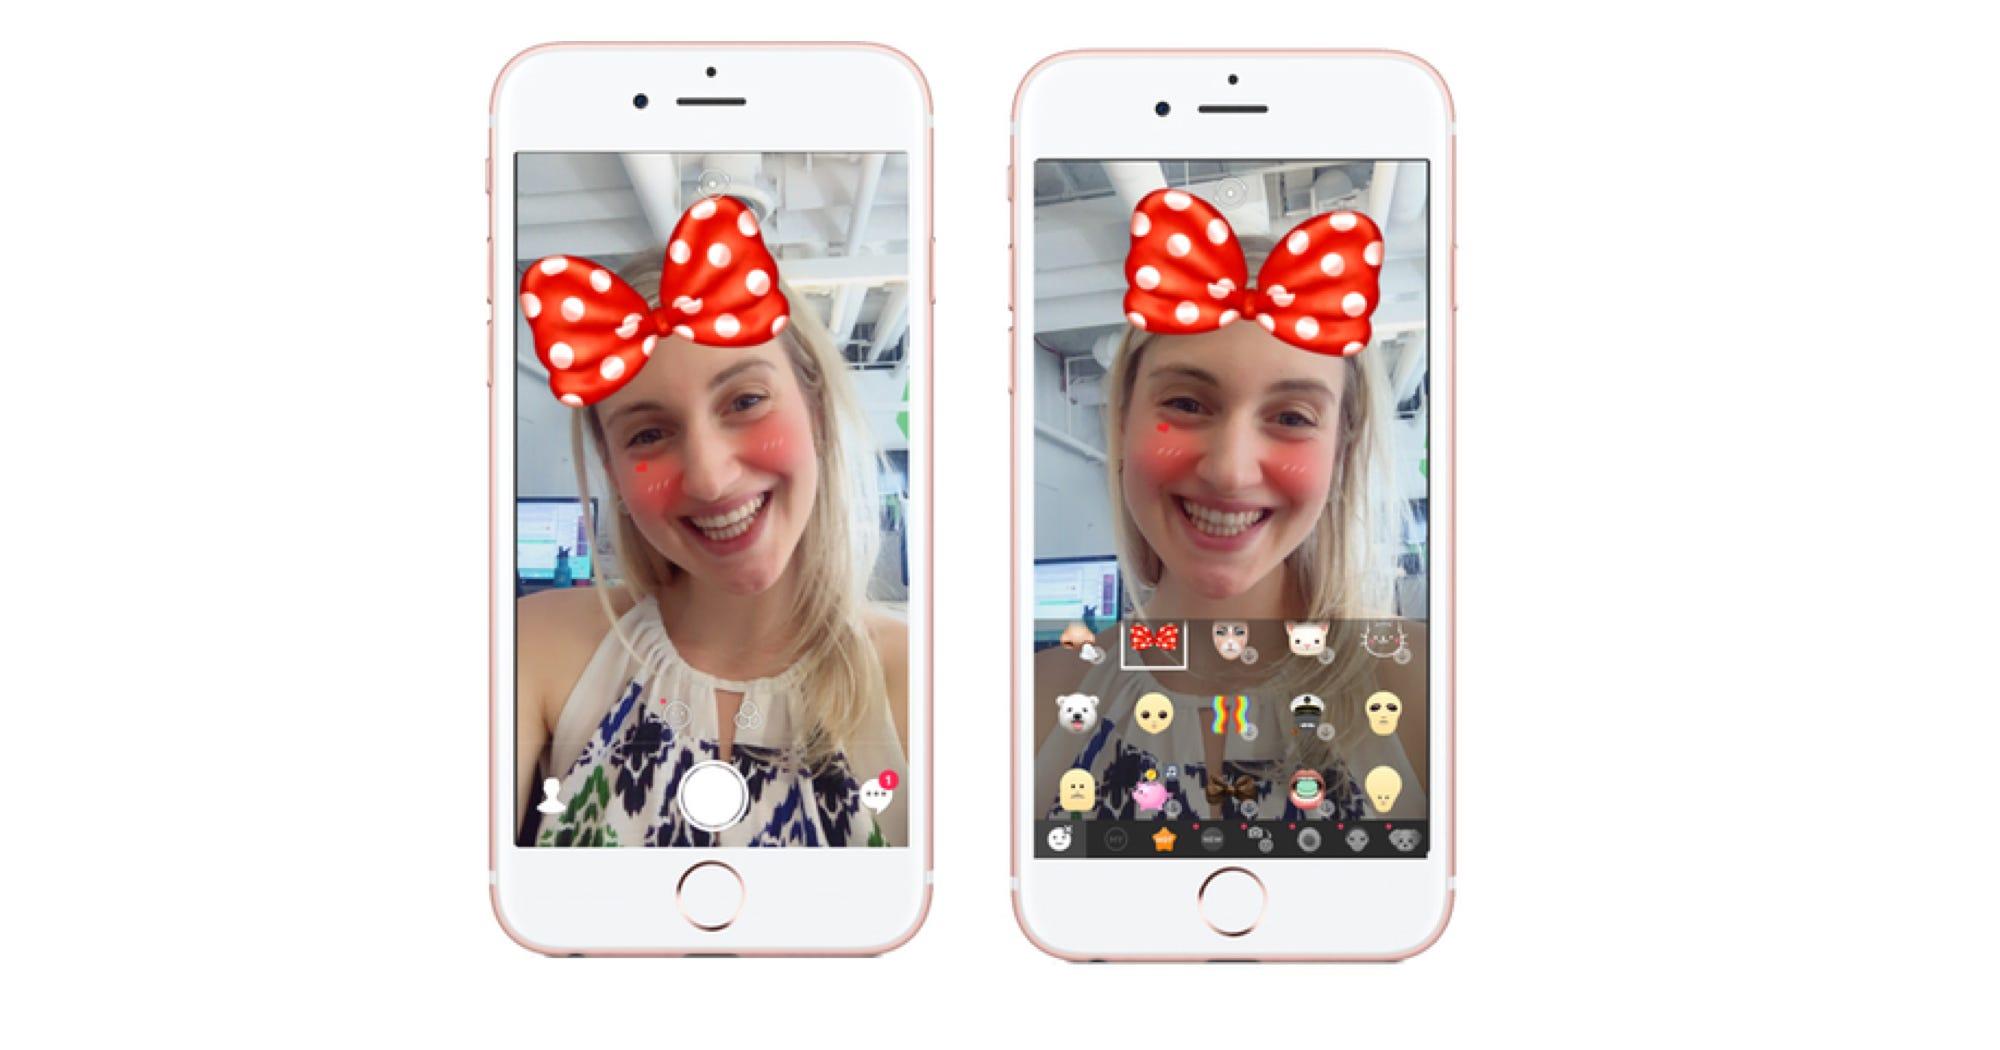 Snow App Filters Best Snapchat Filter Apps Camera